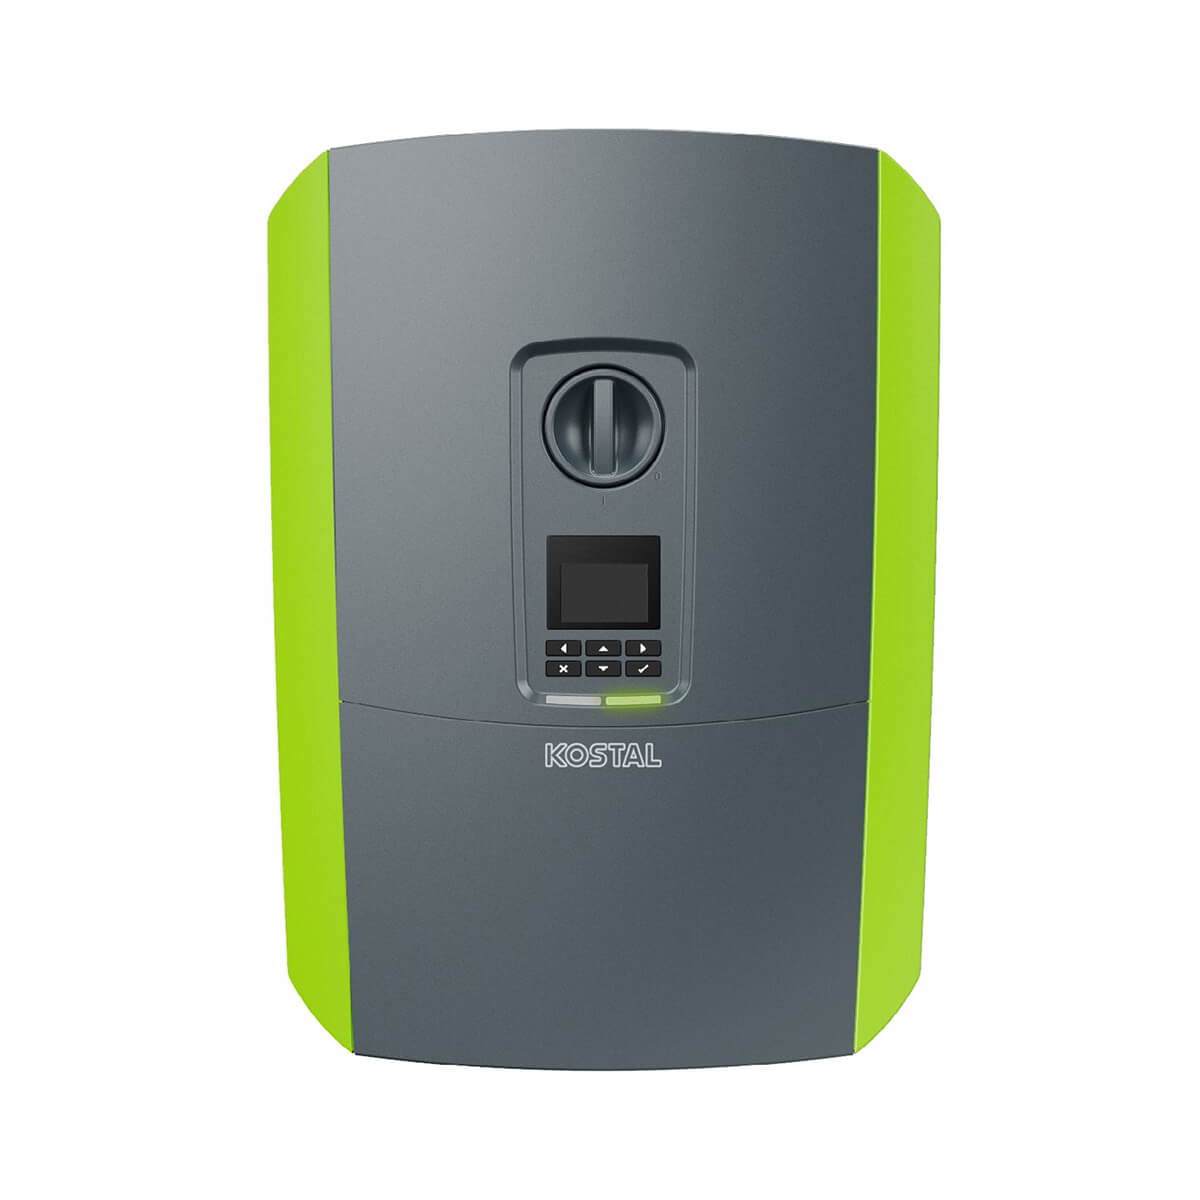 kostal 5.5kW inverter, kostal piko 5.5kW inverter, kostal piko iq 5.5 inverter, kostal piko iq 5.5, kostal piko 5.5 kW